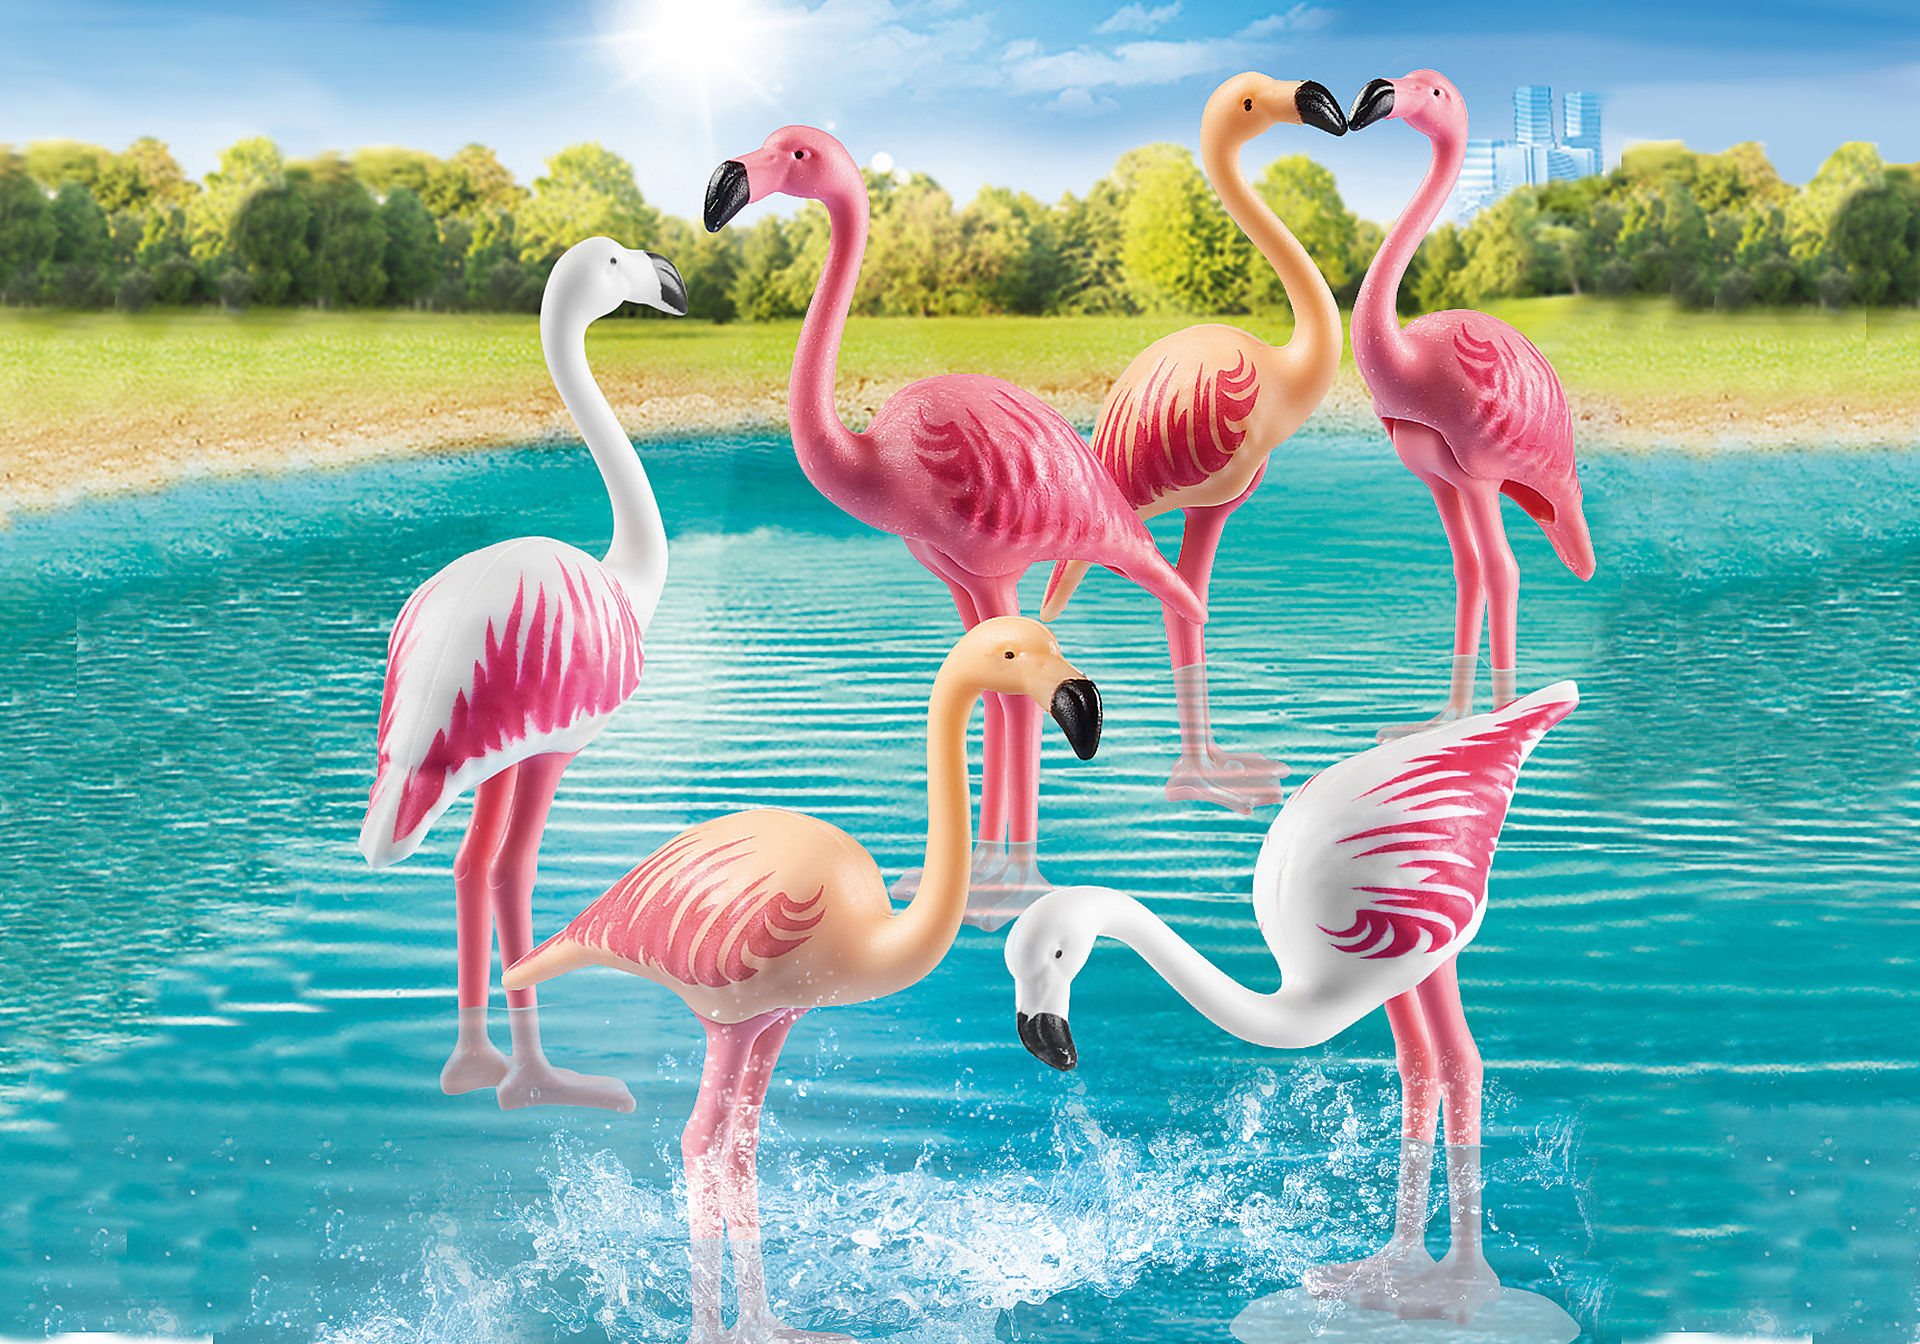 70351 Flamingoschwarm zoom image1